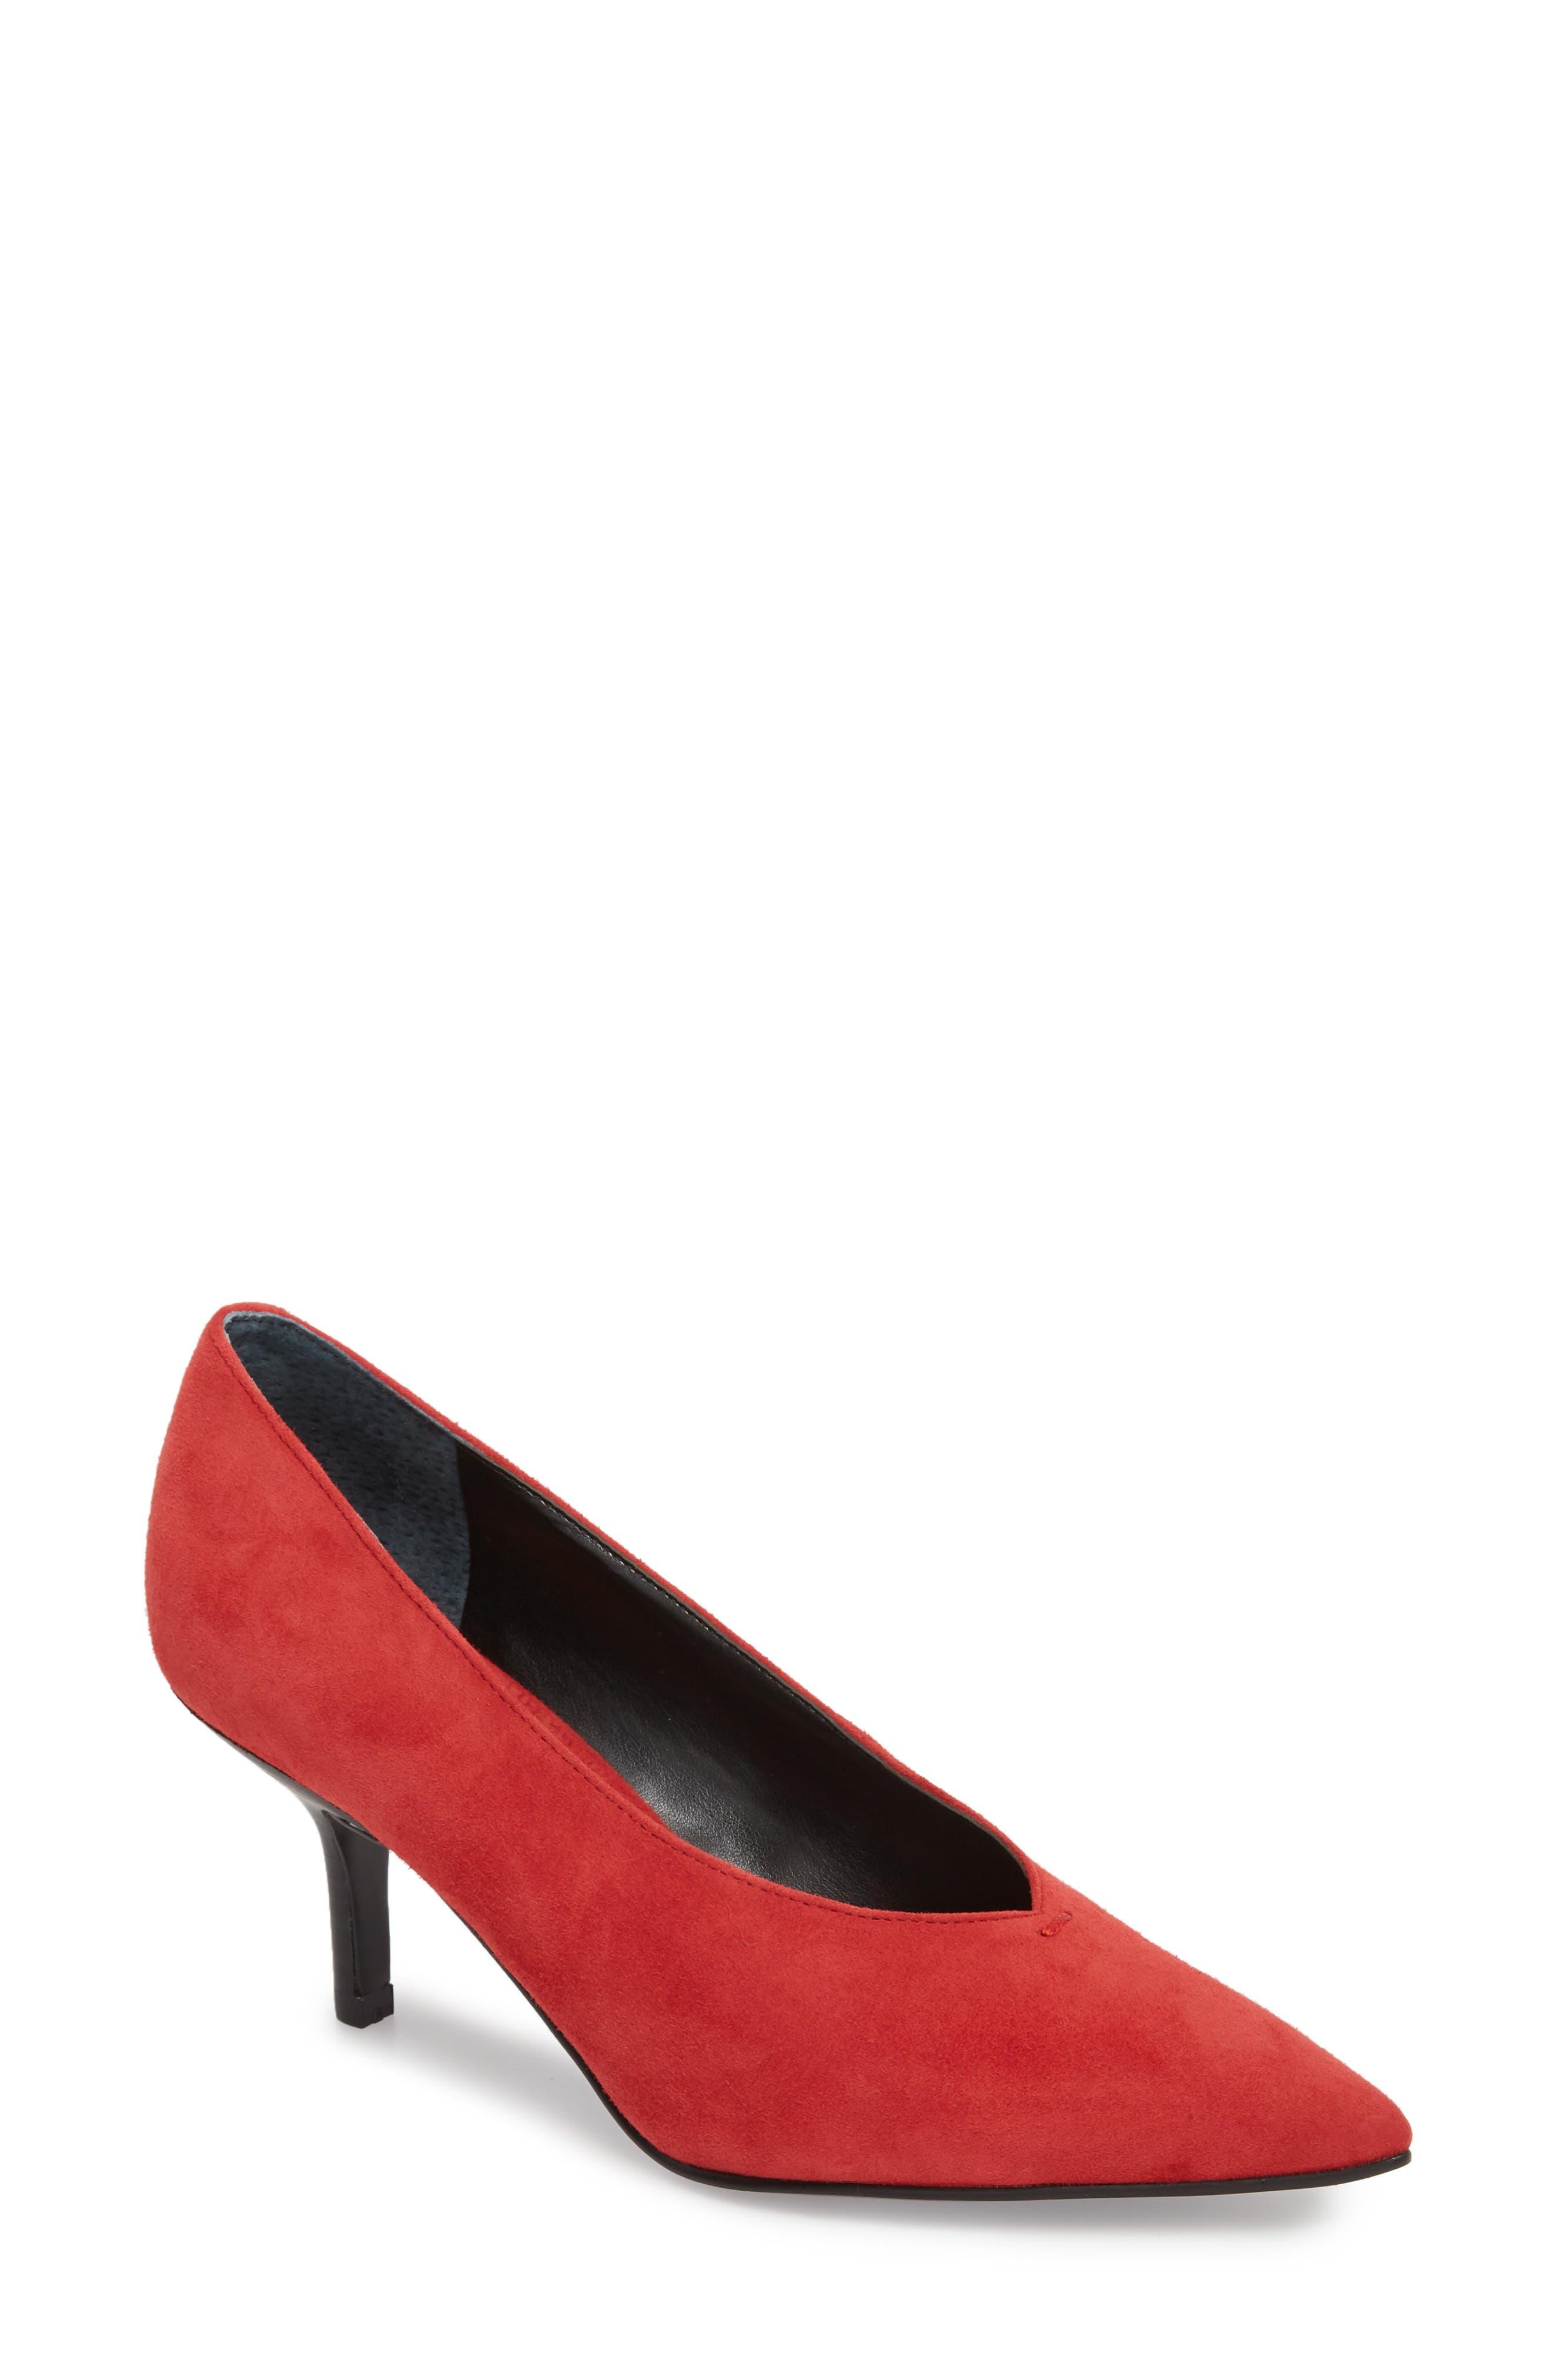 Dallon Kitten Heel Pump,                         Main,                         color, Red Suede